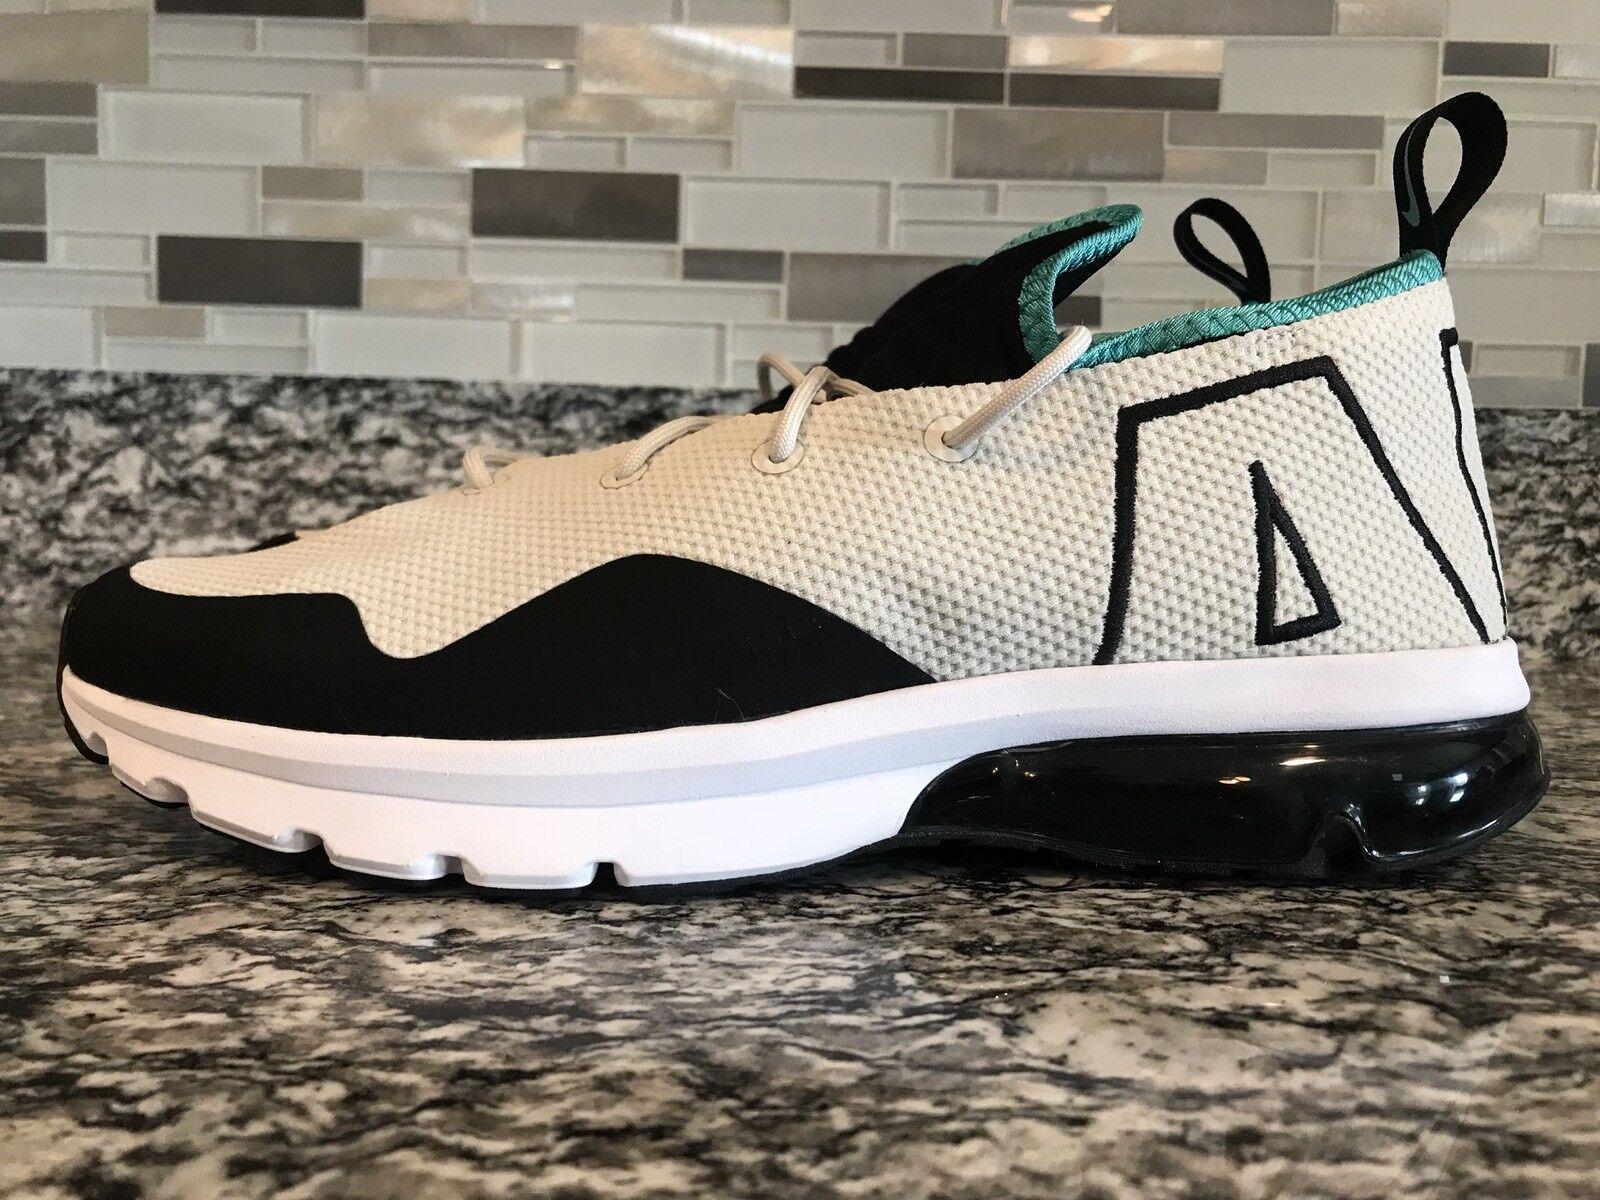 Nike Air Max Flair 50 Light Bone Sport Turquoise White Black Sz 10 AA3824 004